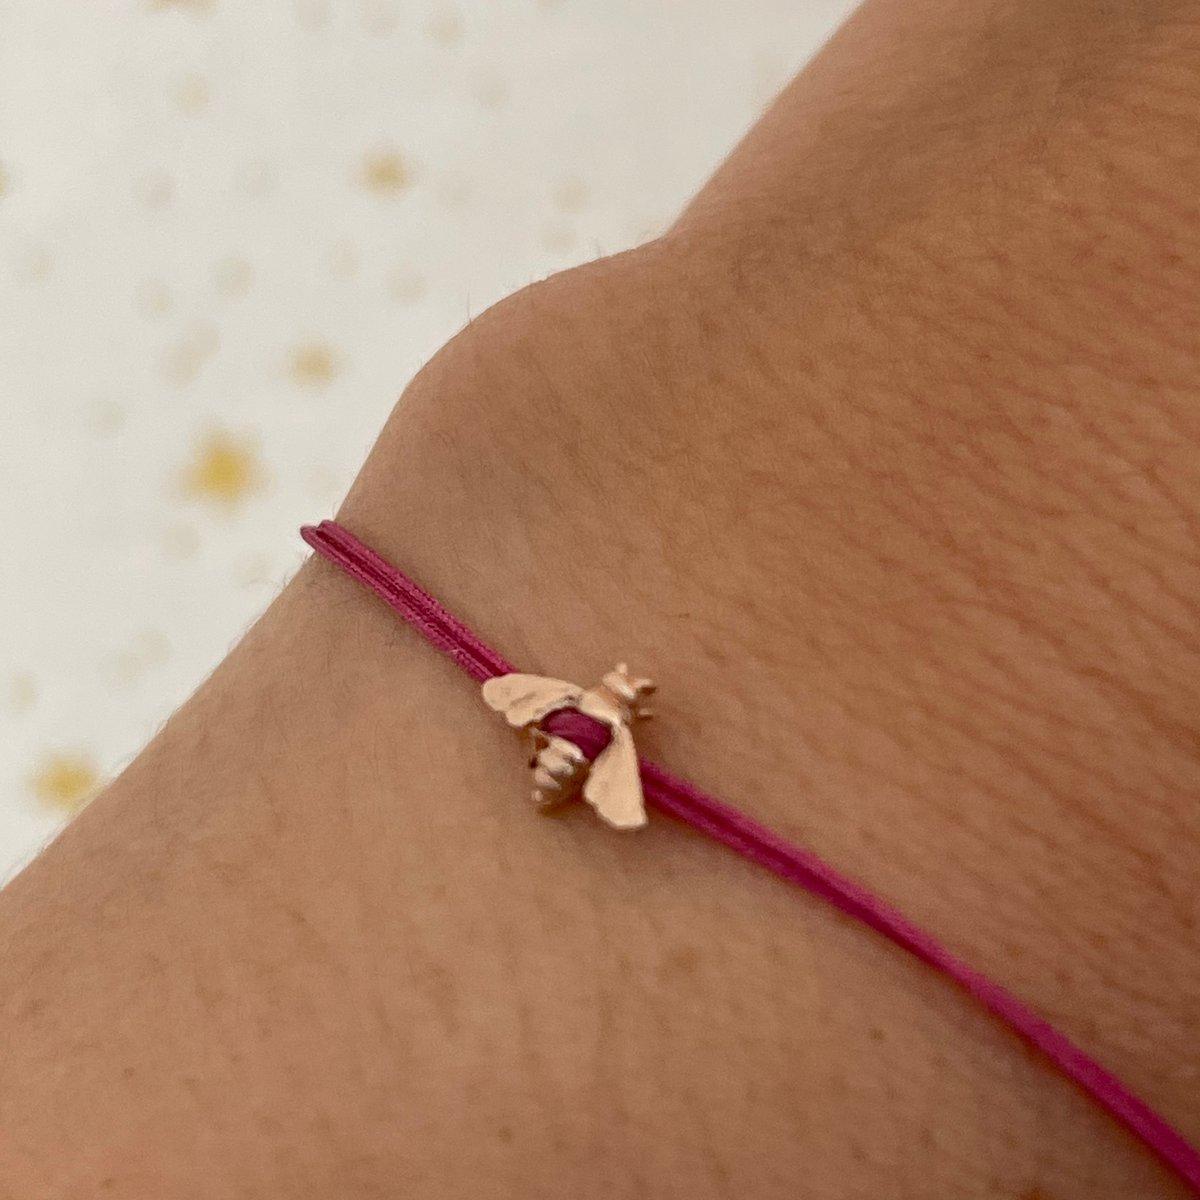 Image of gold bee bracelet